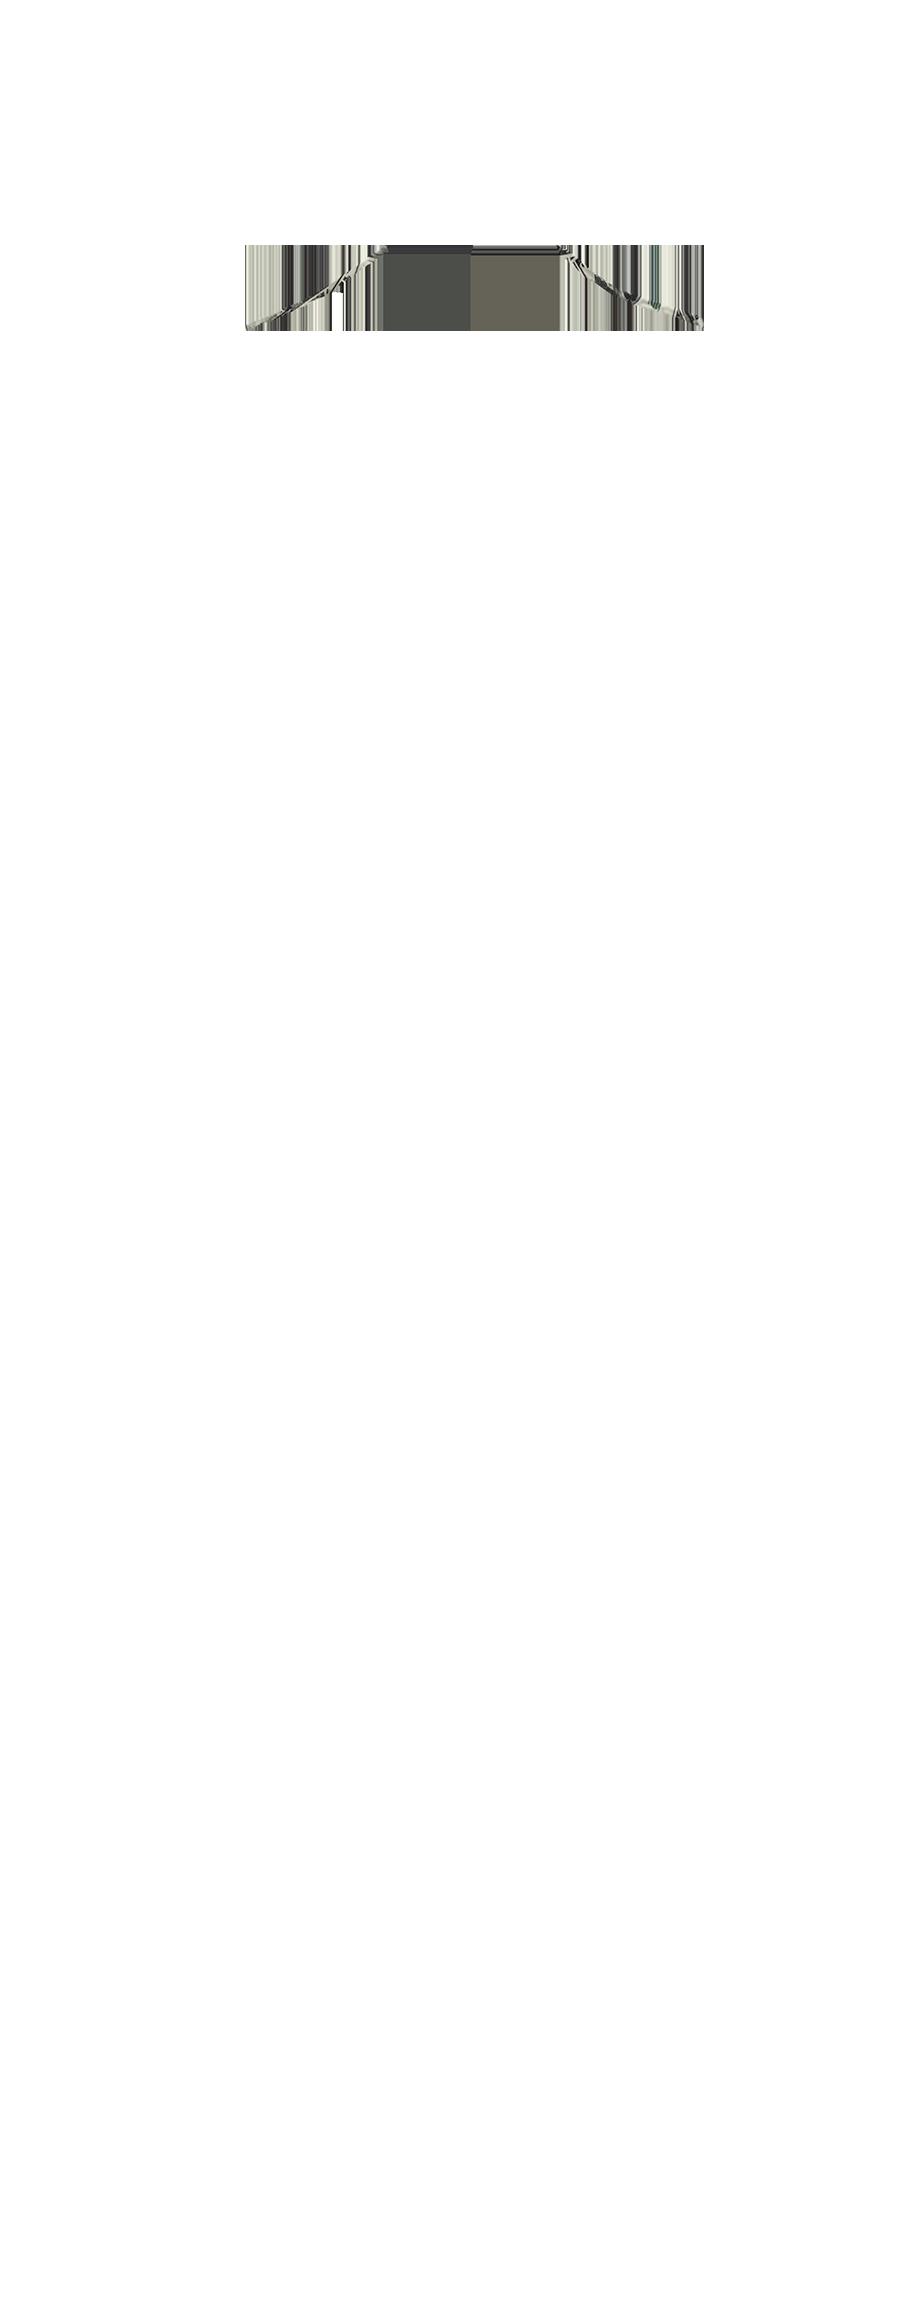 NEFL-7